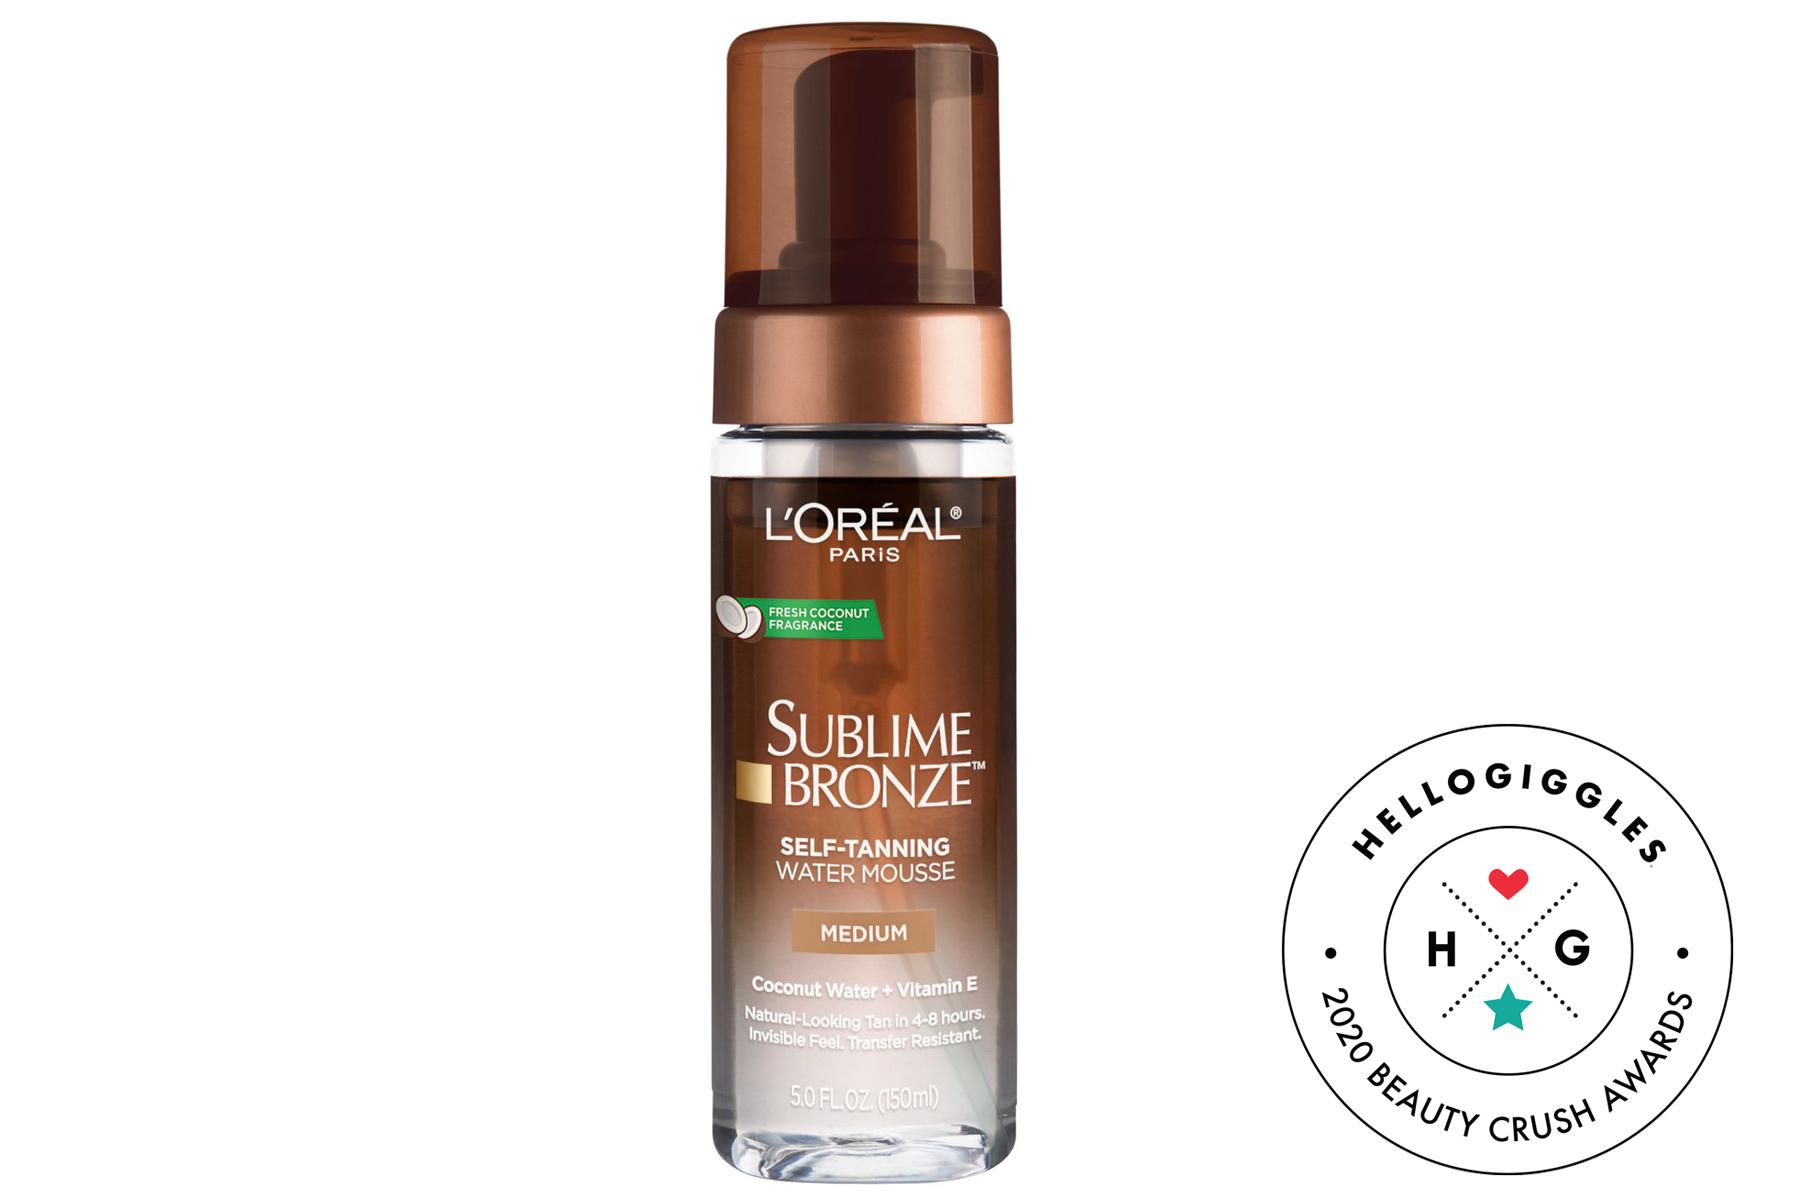 best drugstore self tanner, loreal paris sublime bronze water mousse